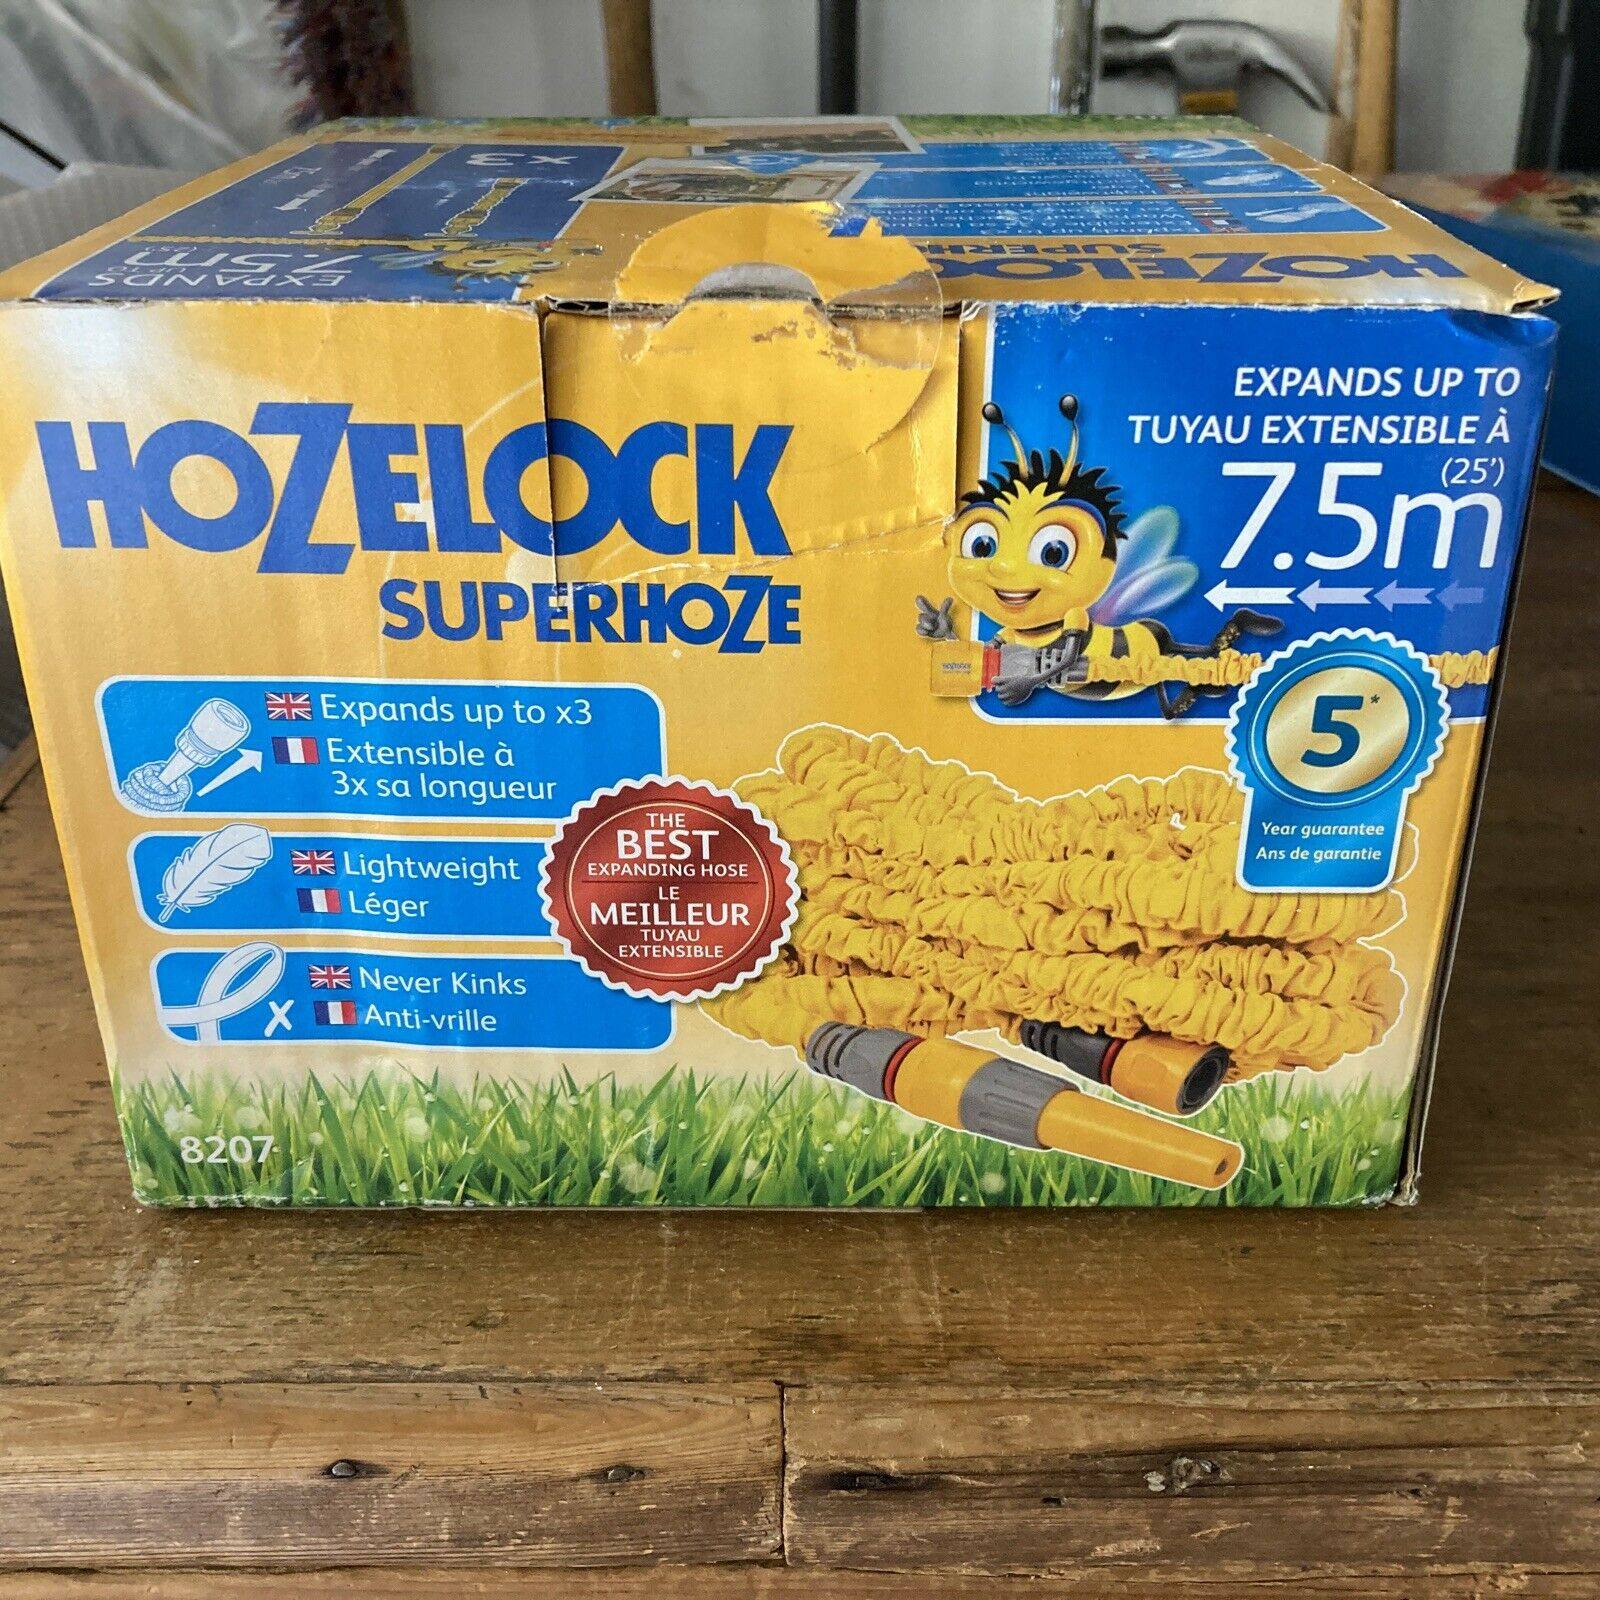 Hozelock Superhoze 7.5m, Used Once.